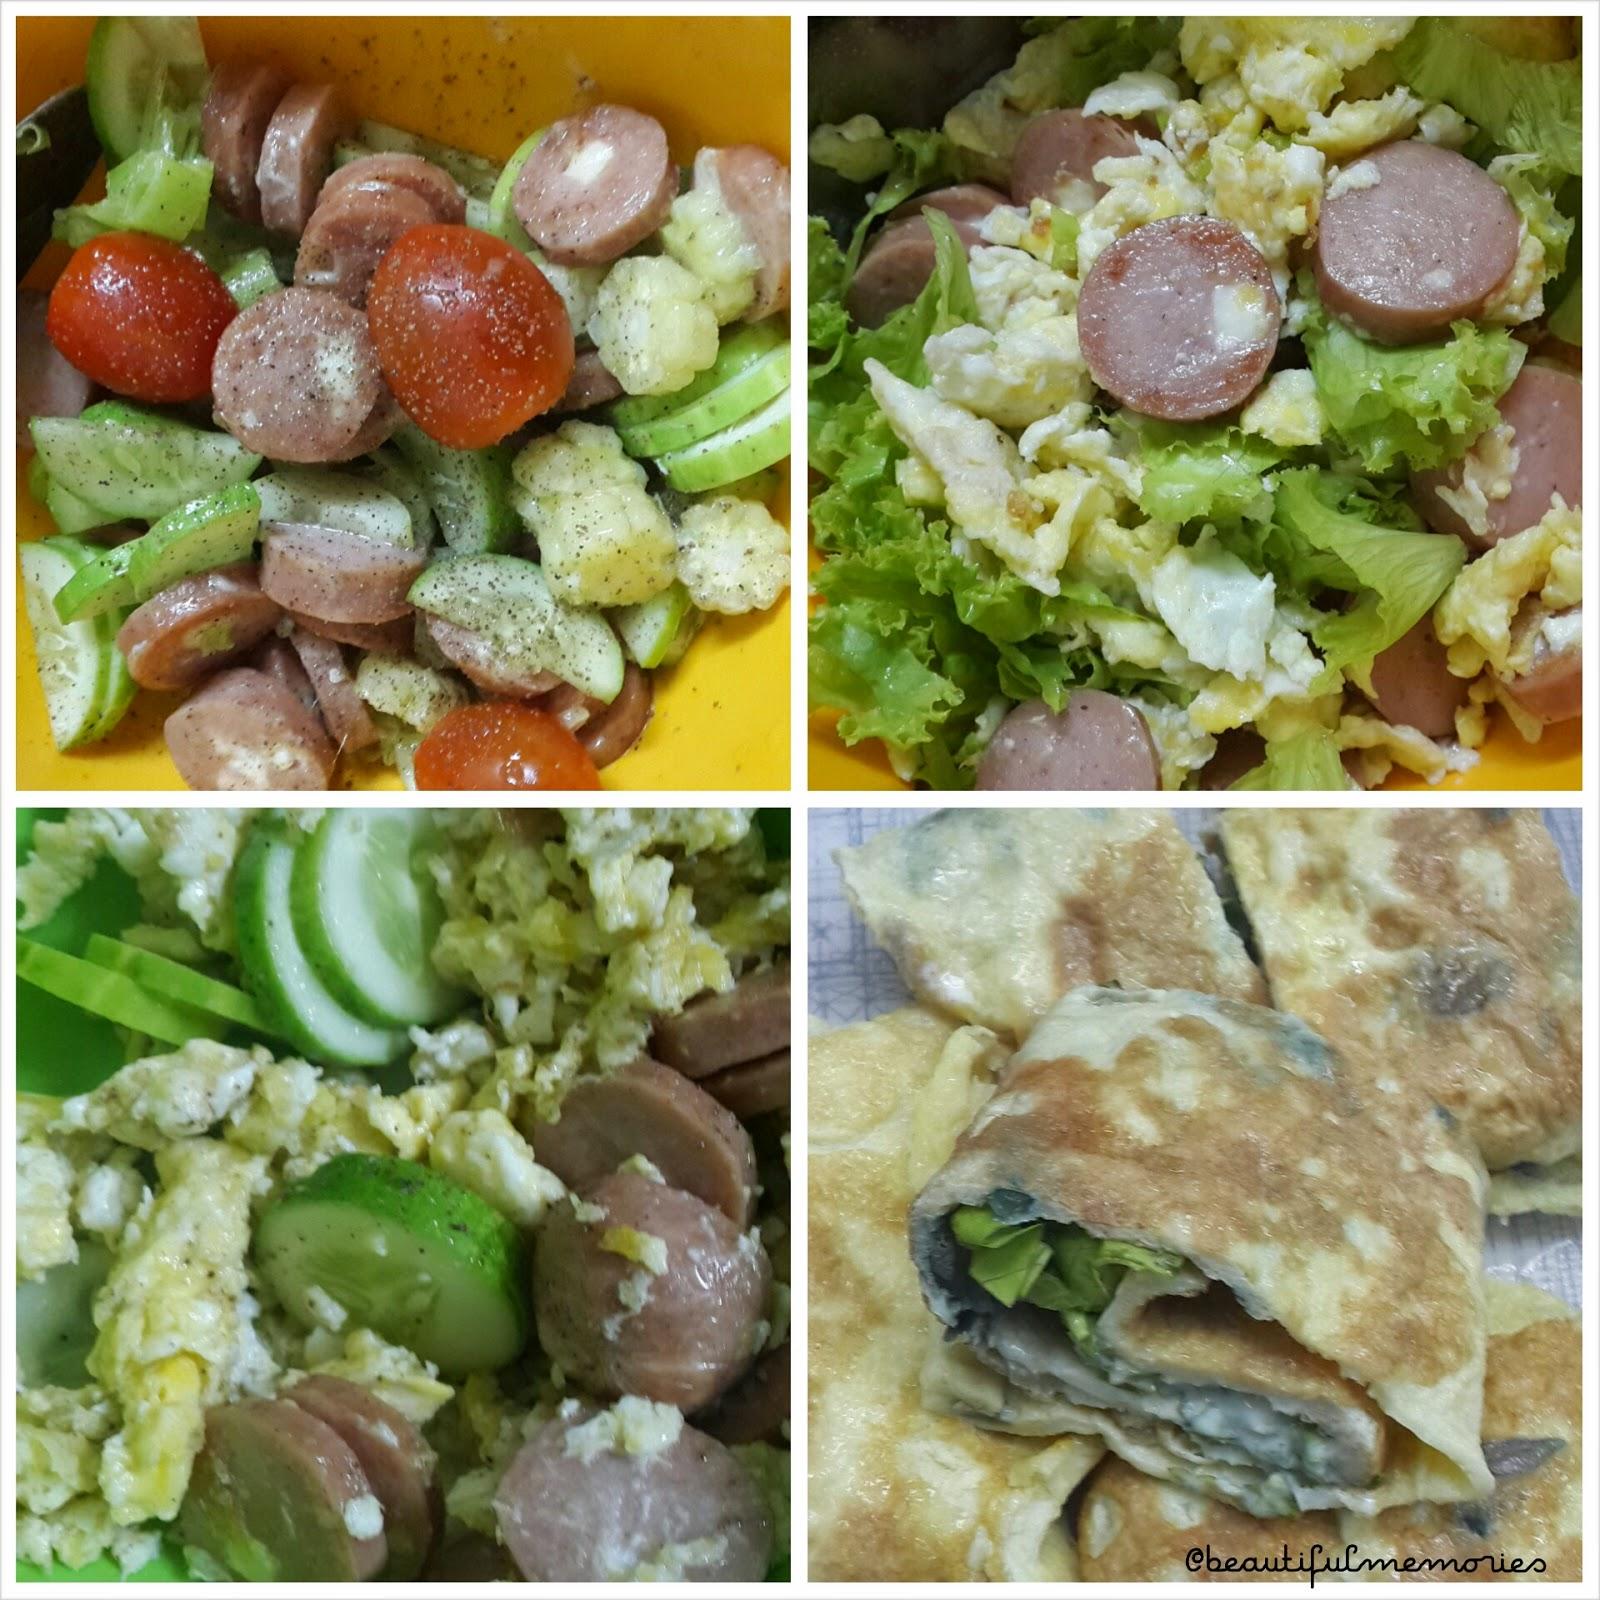 Makanan Pembuka Dari Eropa